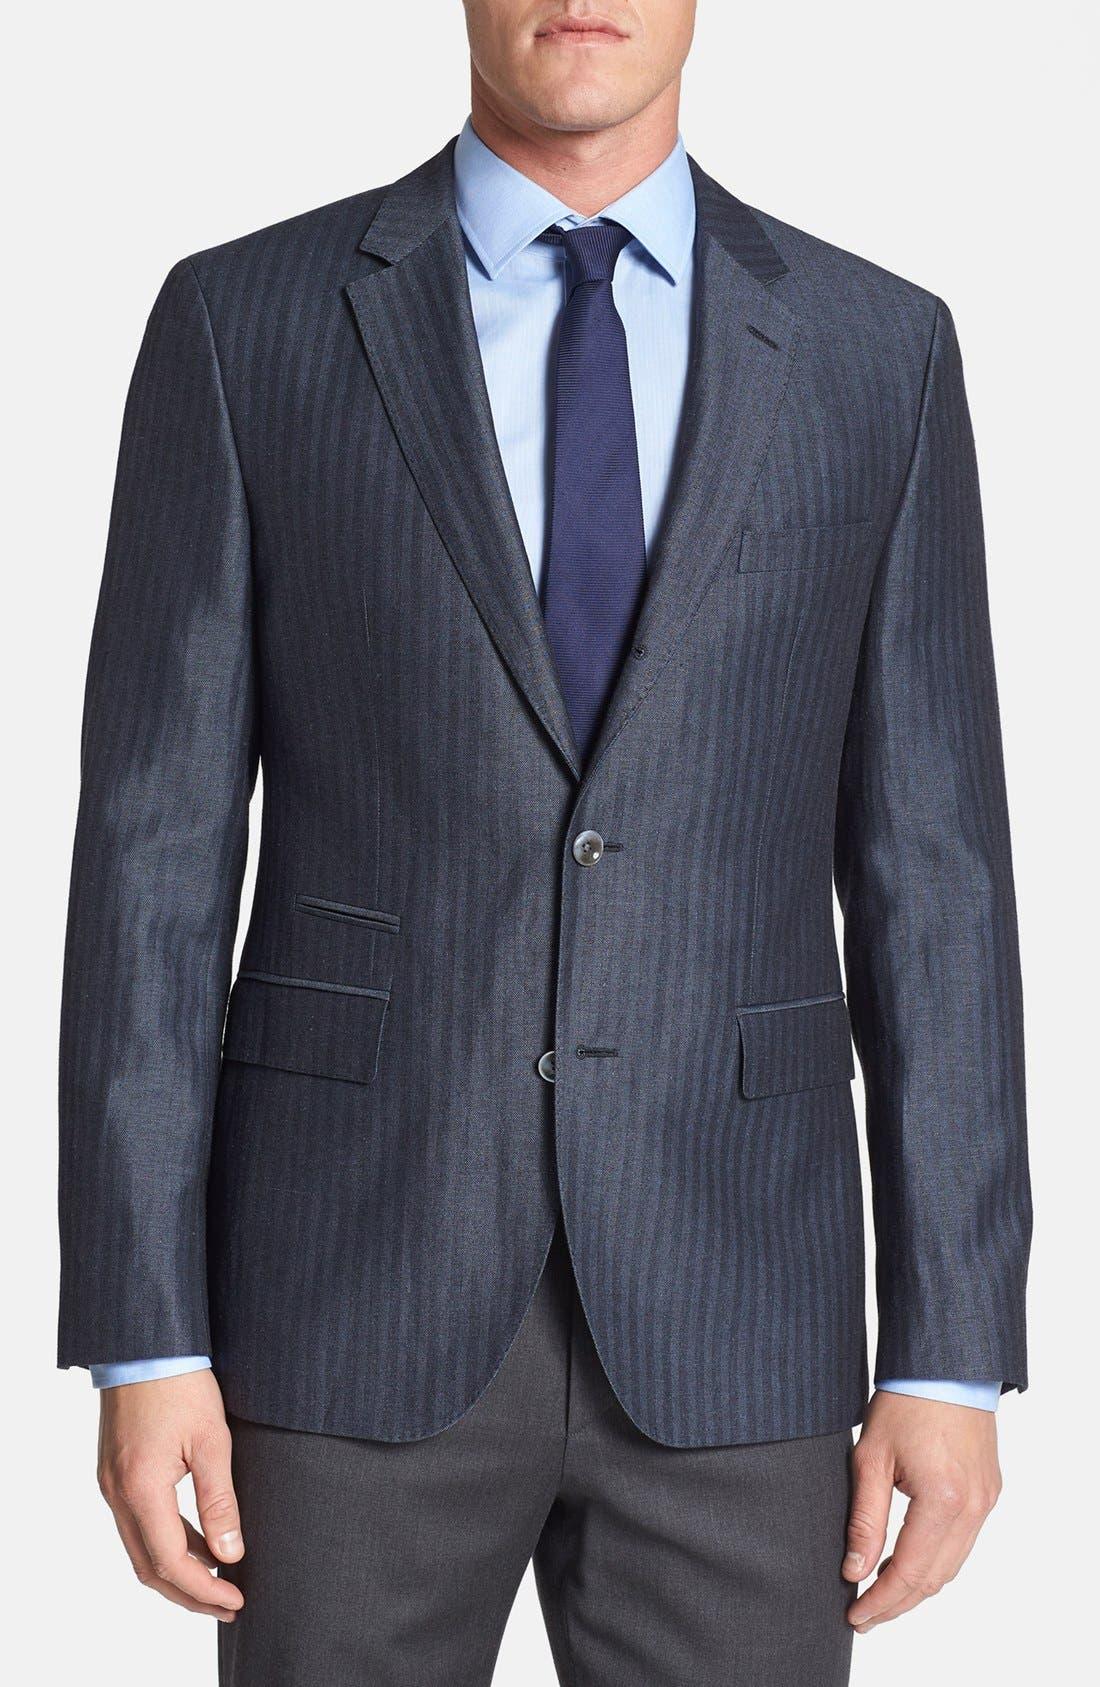 Main Image - BOSS HUGO BOSS 'Johnston' Trim Fit Herringbone Sportcoat